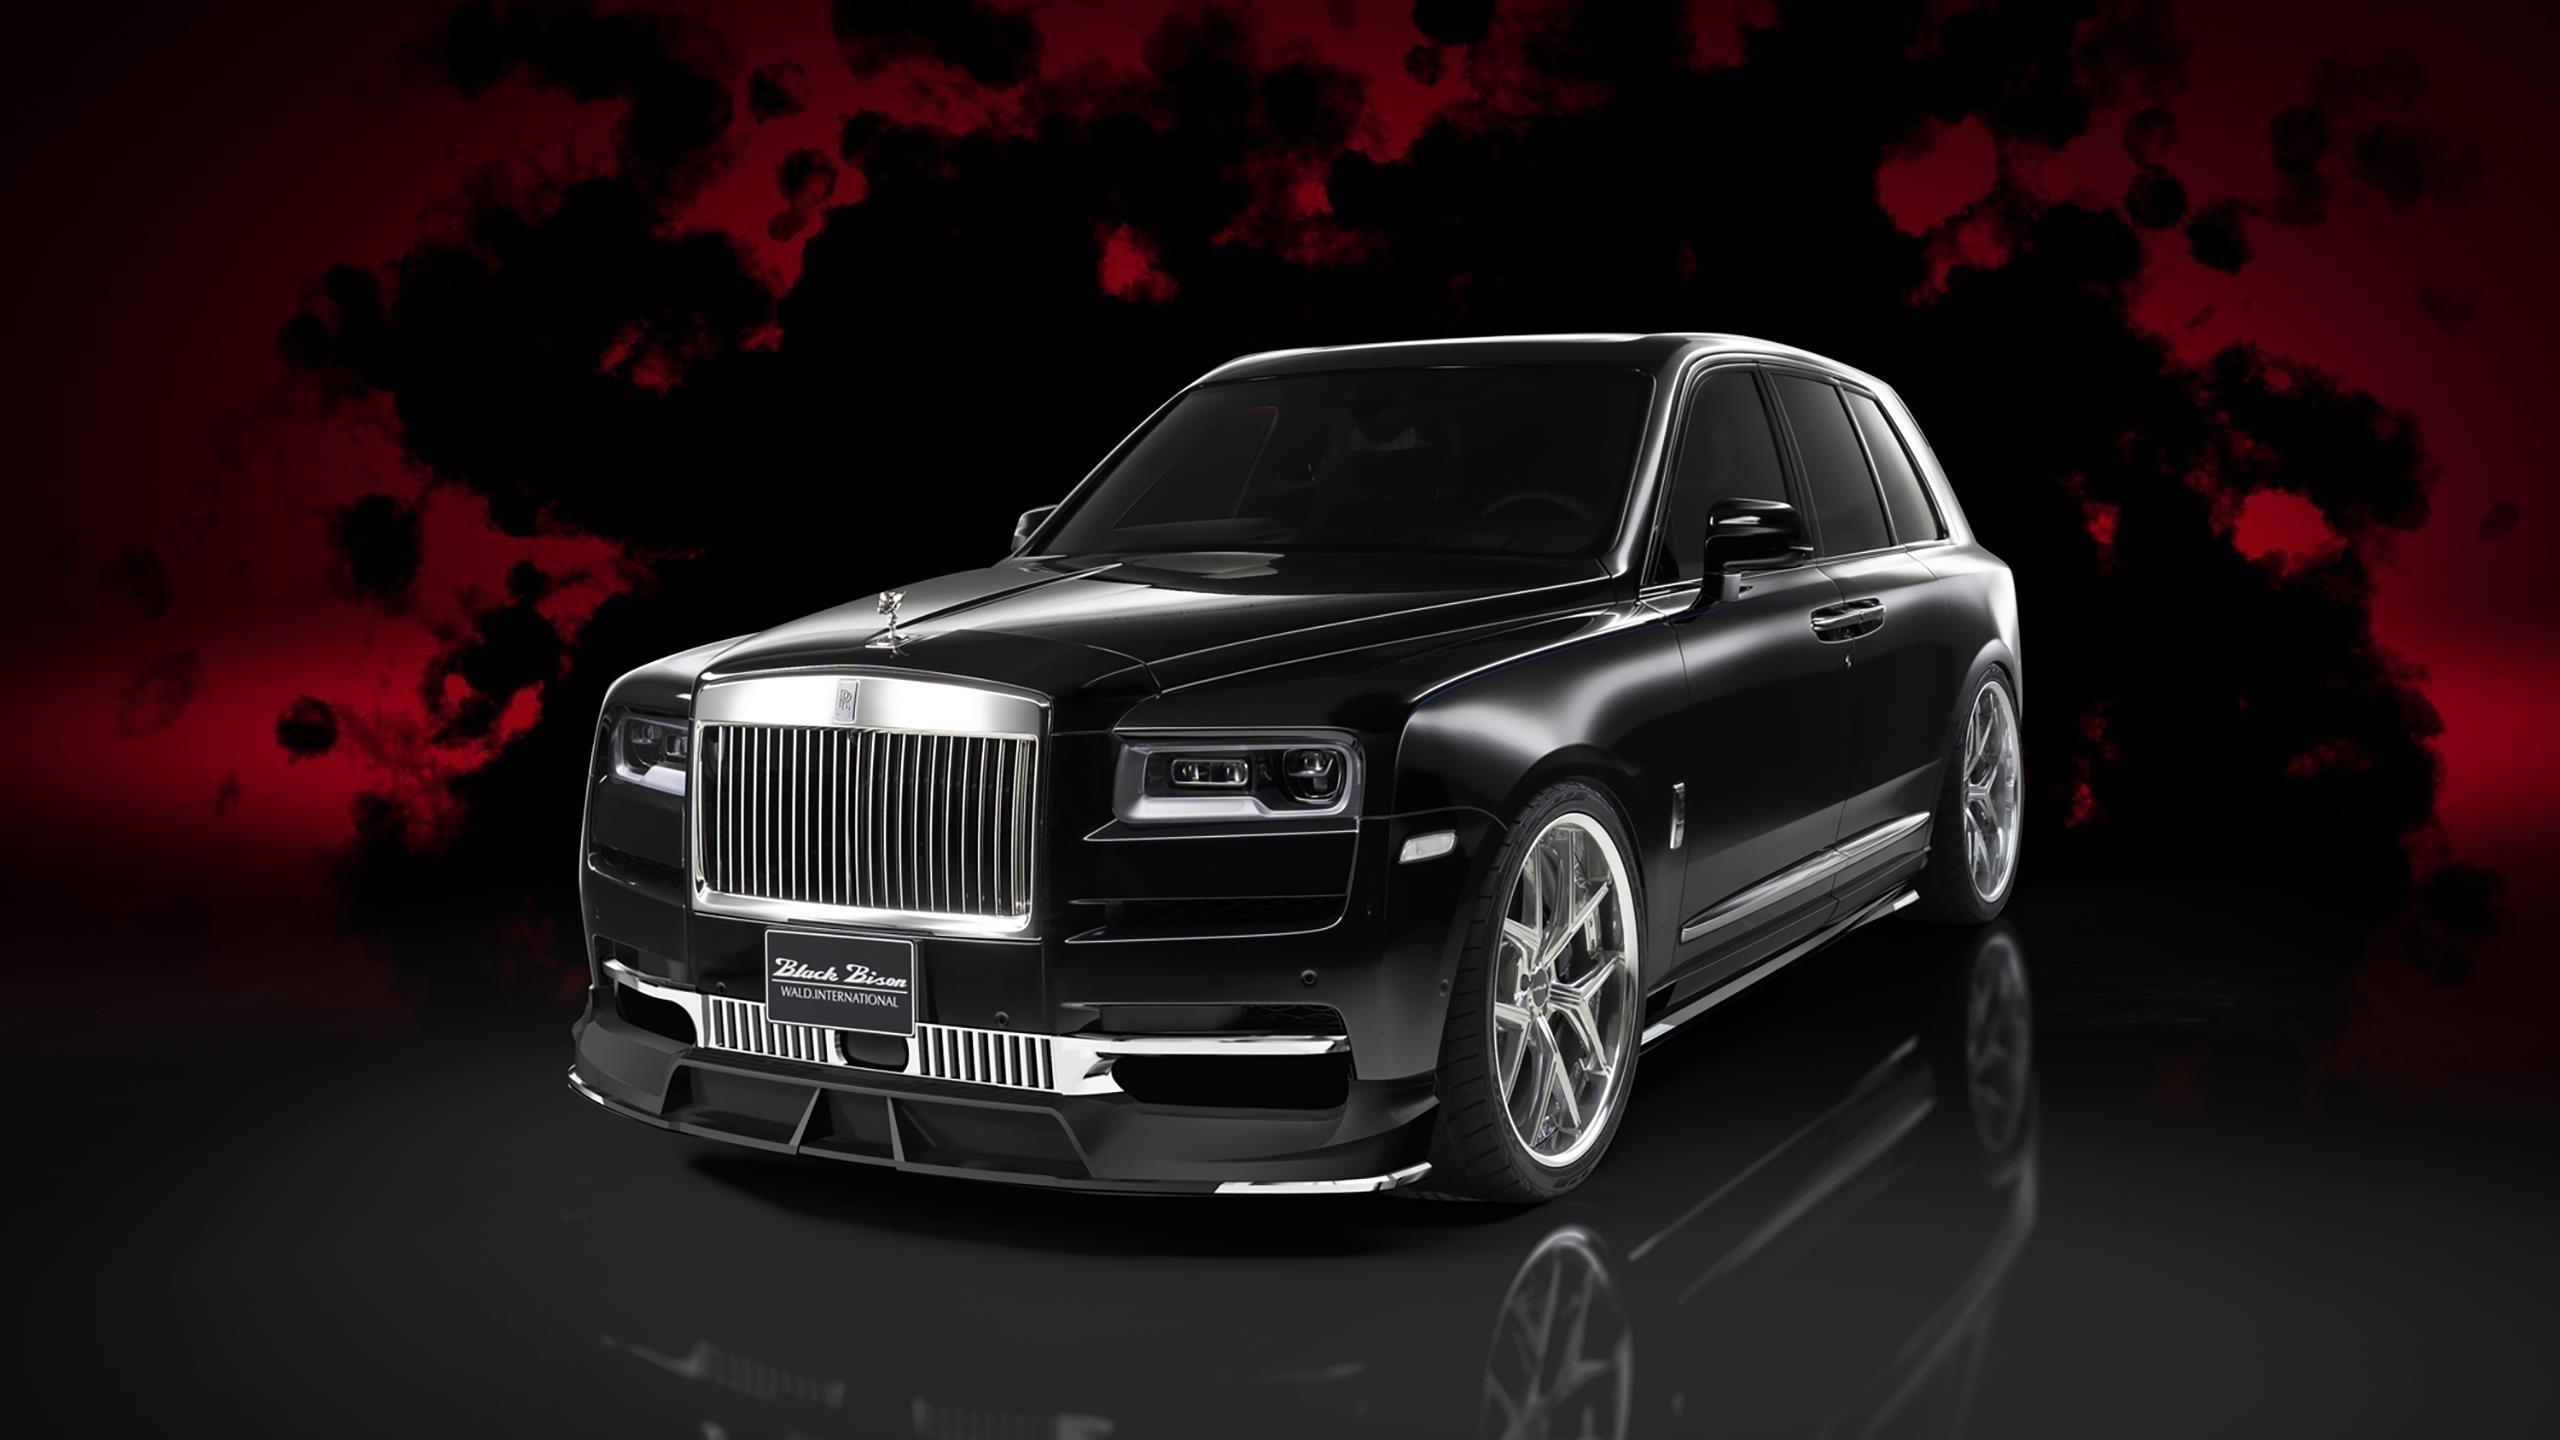 Wald rolls-royce cullinan sports line black bison edition 2020 автомобили обои скачать